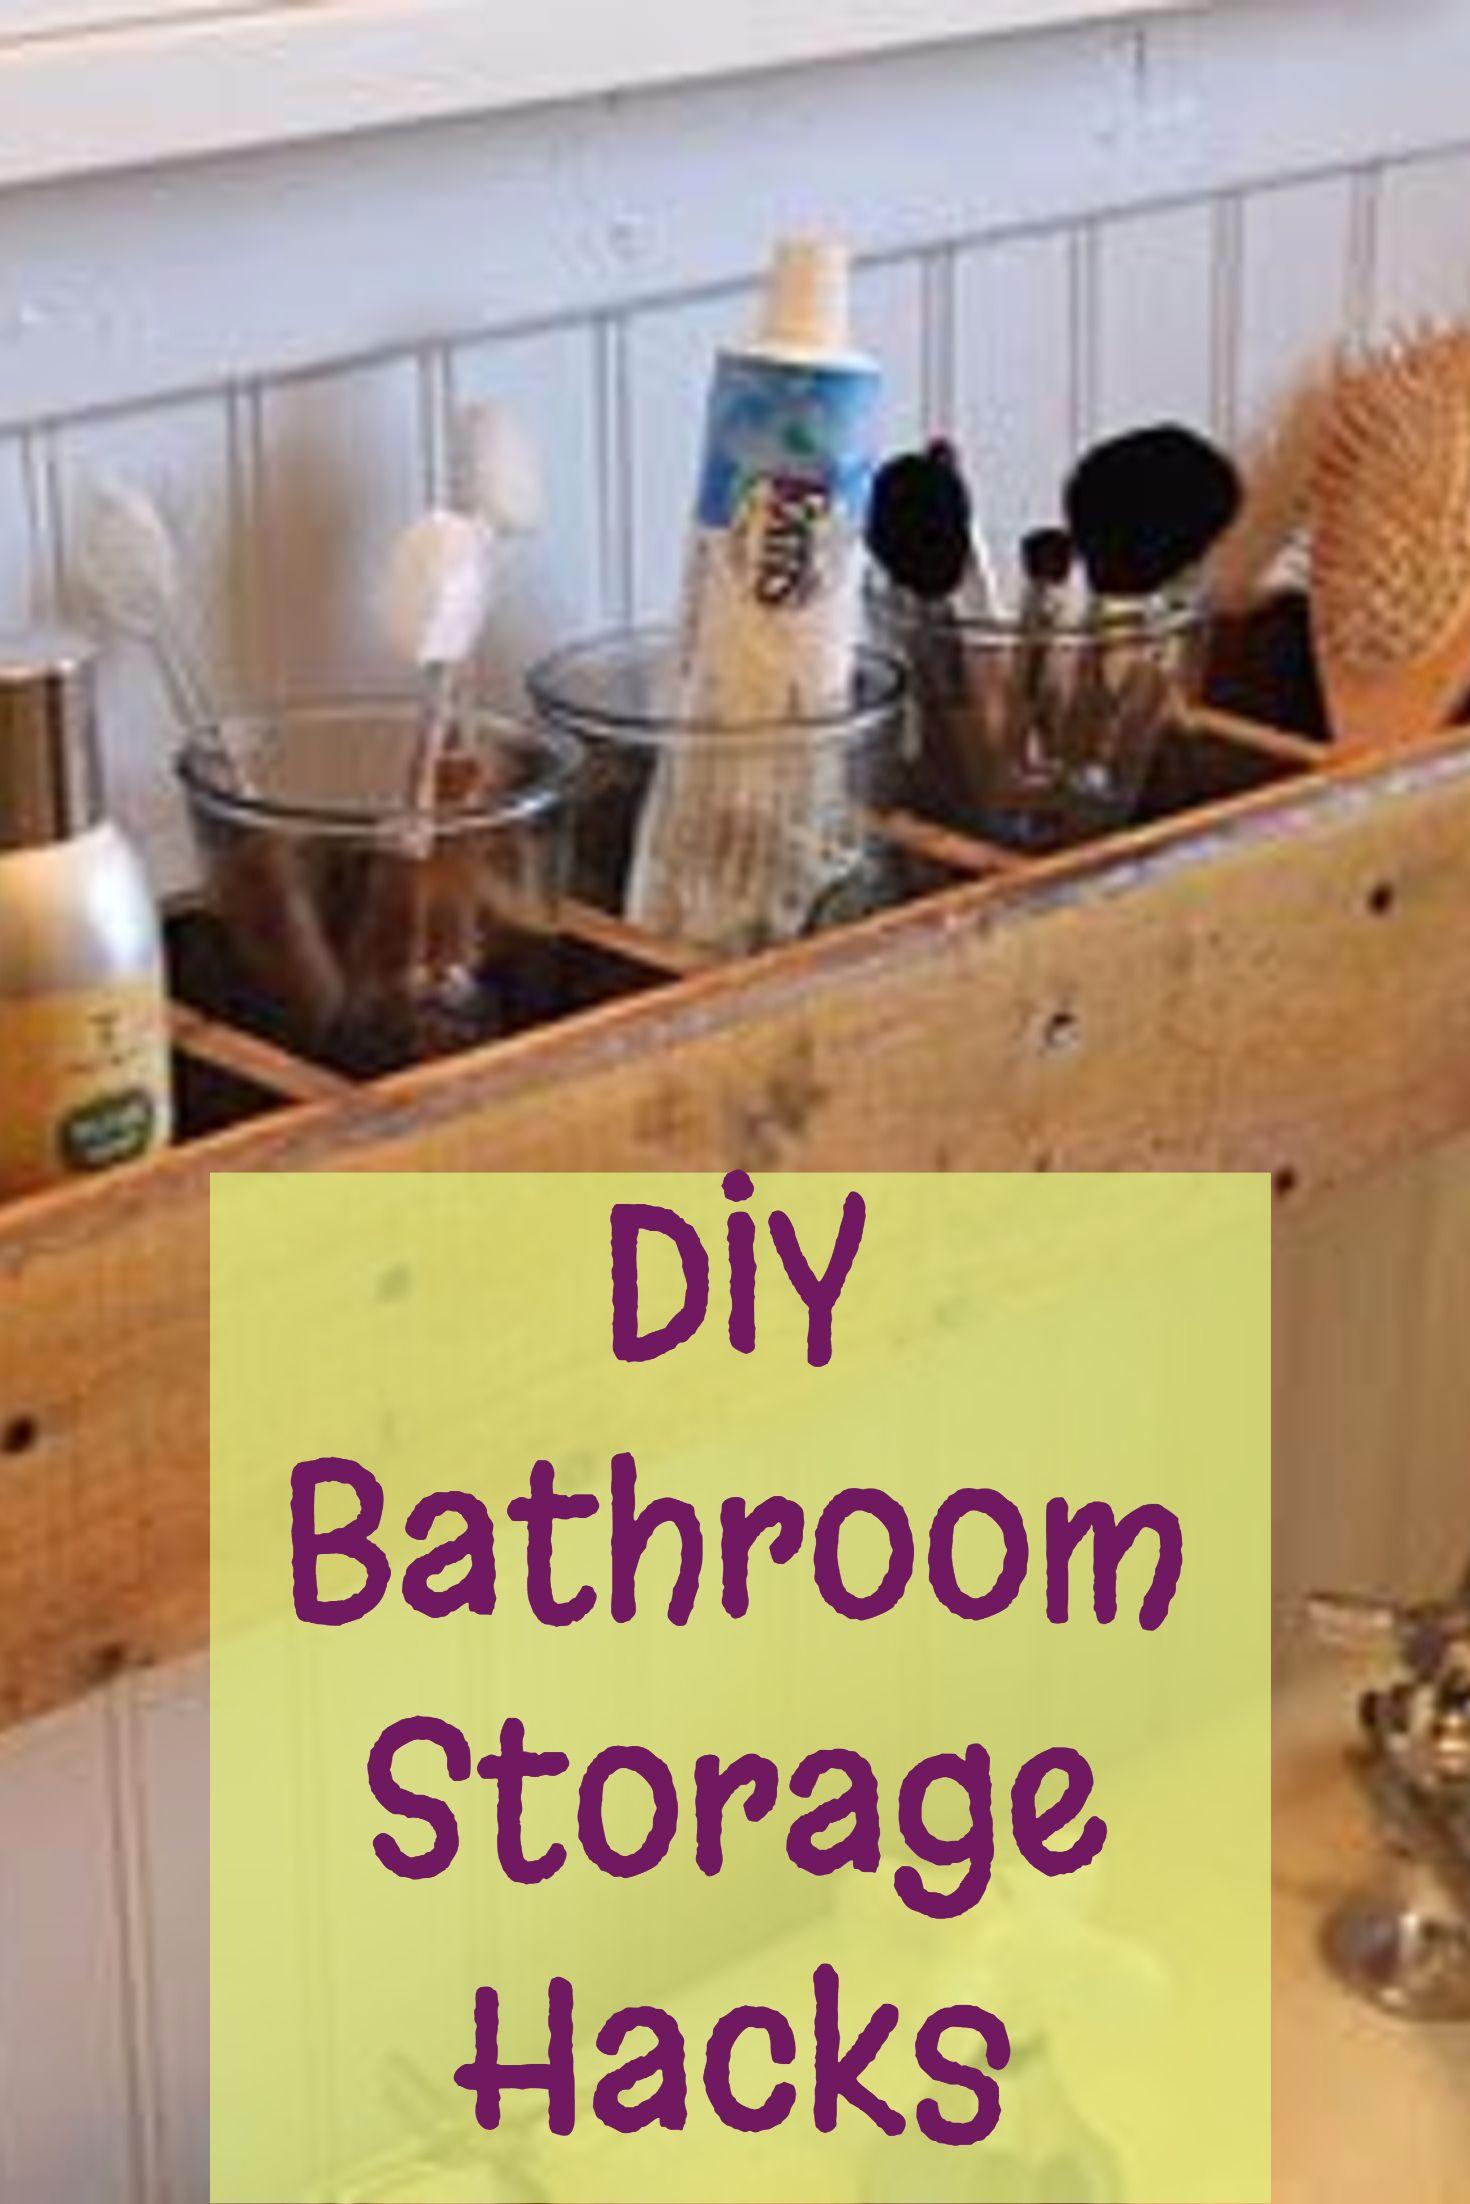 Diy small bathroom storage ideas - Creative Storage Solutions For To Organize The Bathroom Helpful Diy Storage Ideas Great For